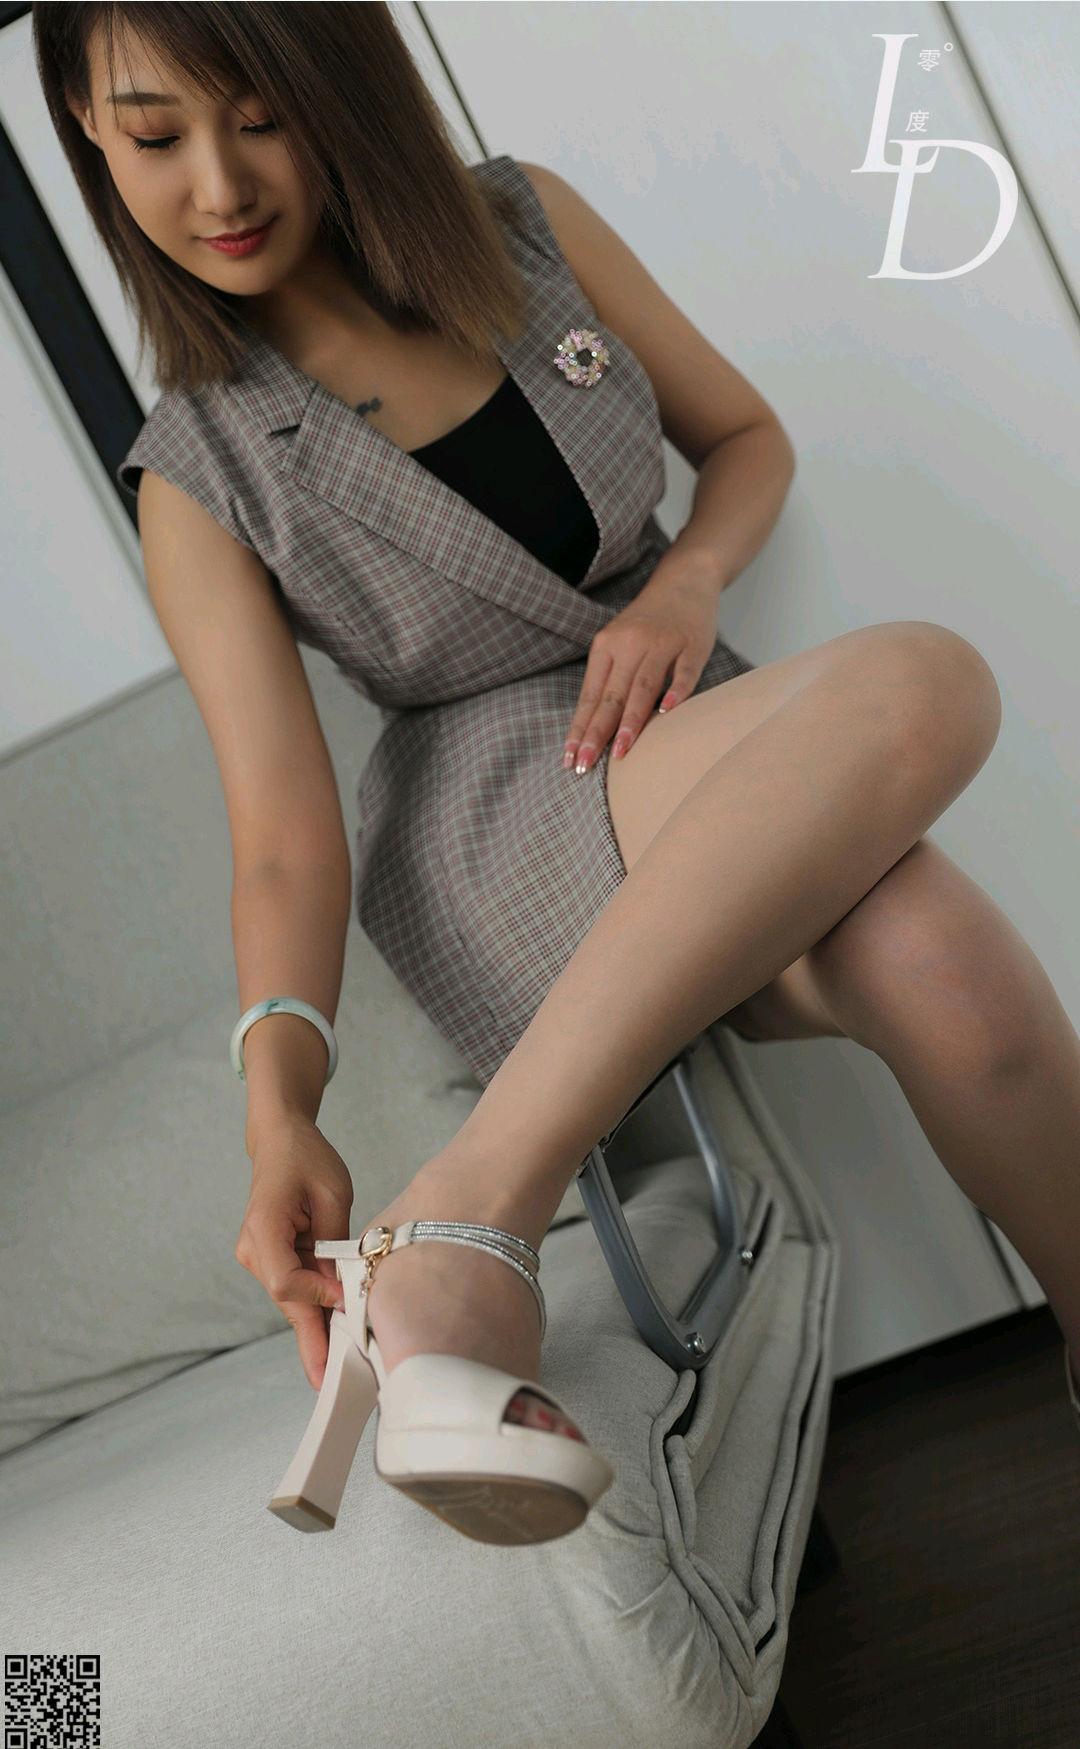 VOL.1602 [LD零度]肉丝美腿:小楠楠高品质写真套图(57P)